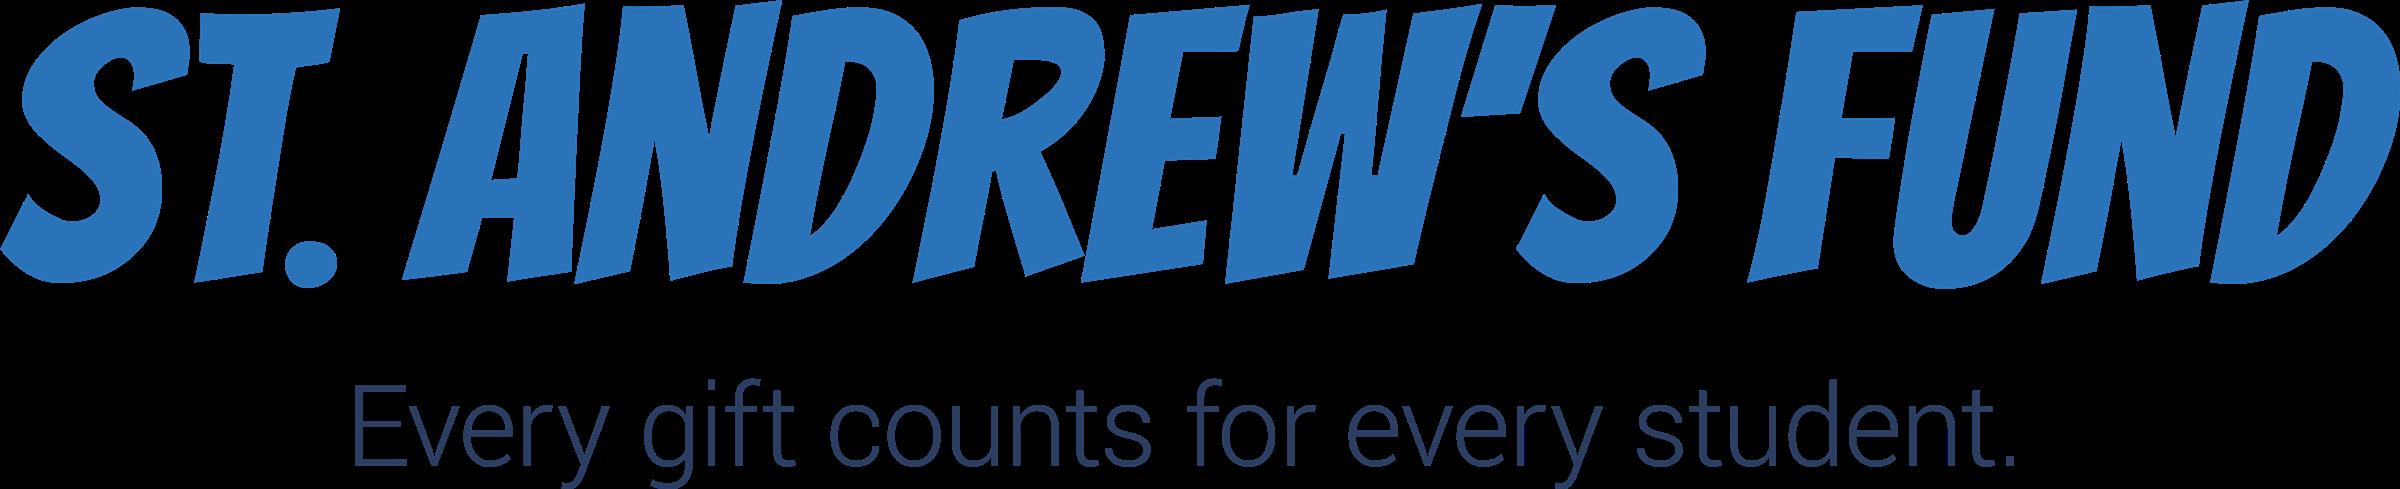 St. Andrew's Fund Logo